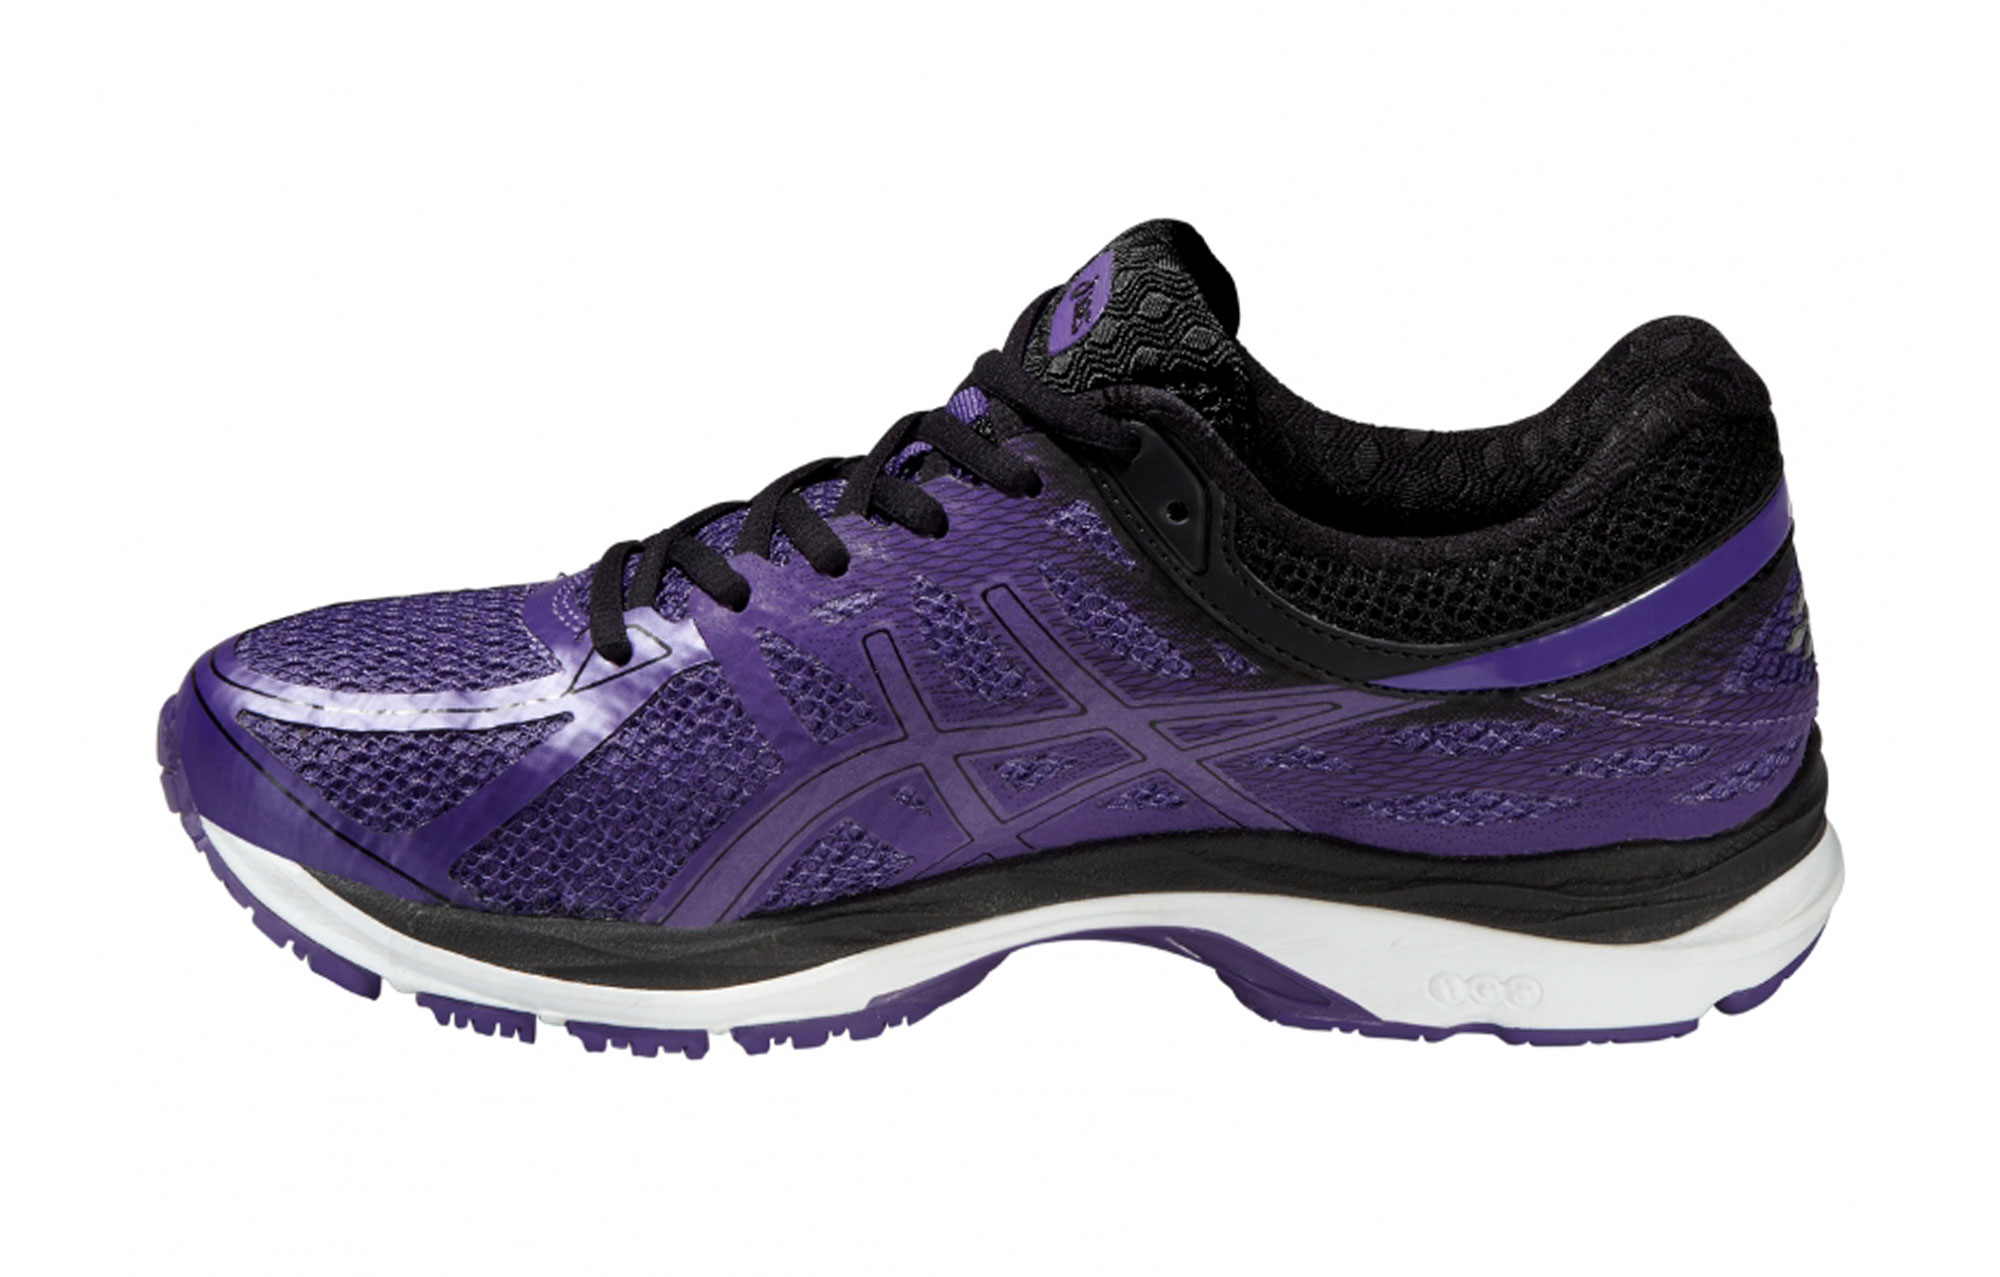 asics gel cumulus 16 womens running shoes. Black Bedroom Furniture Sets. Home Design Ideas